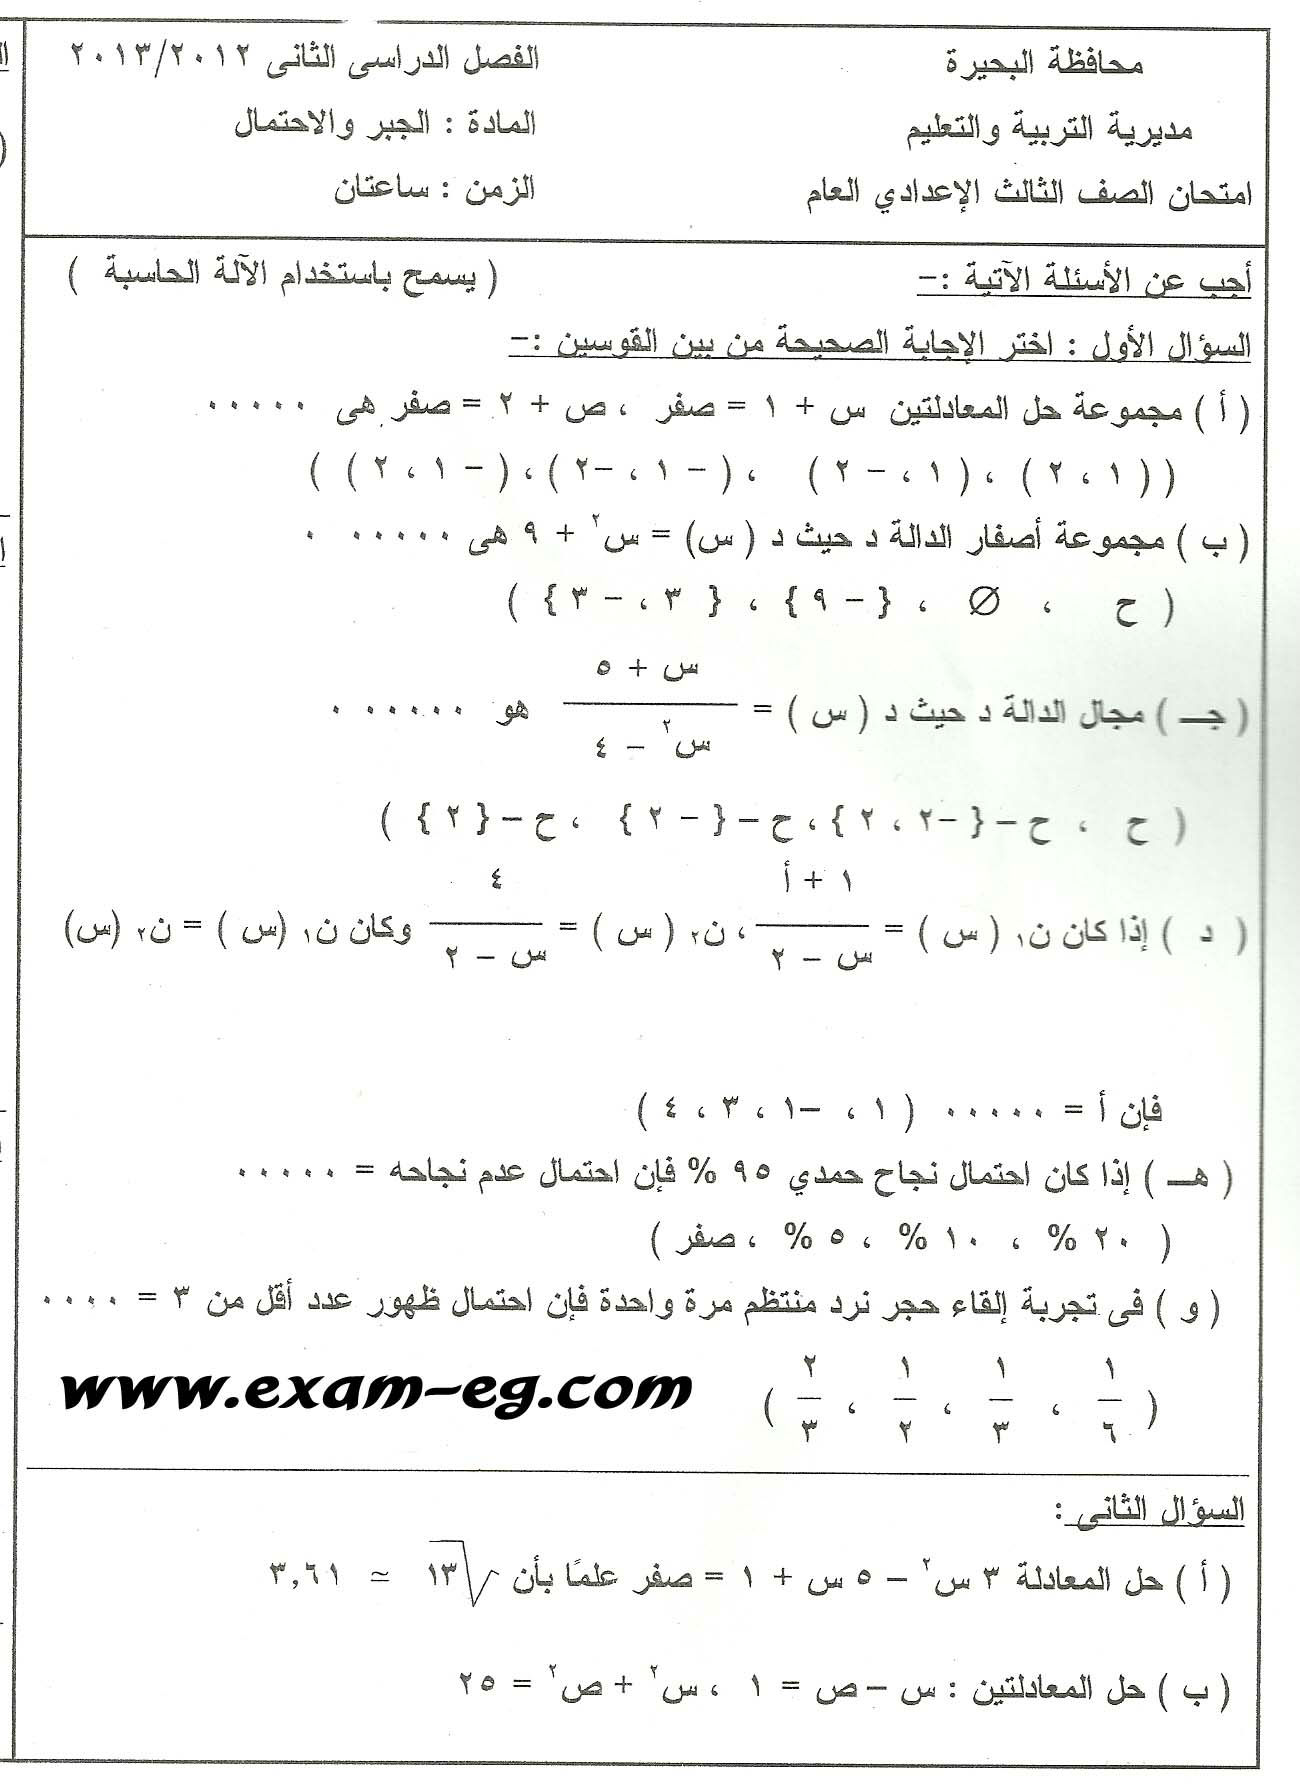 exam-eg.com_1392435023961.jpg